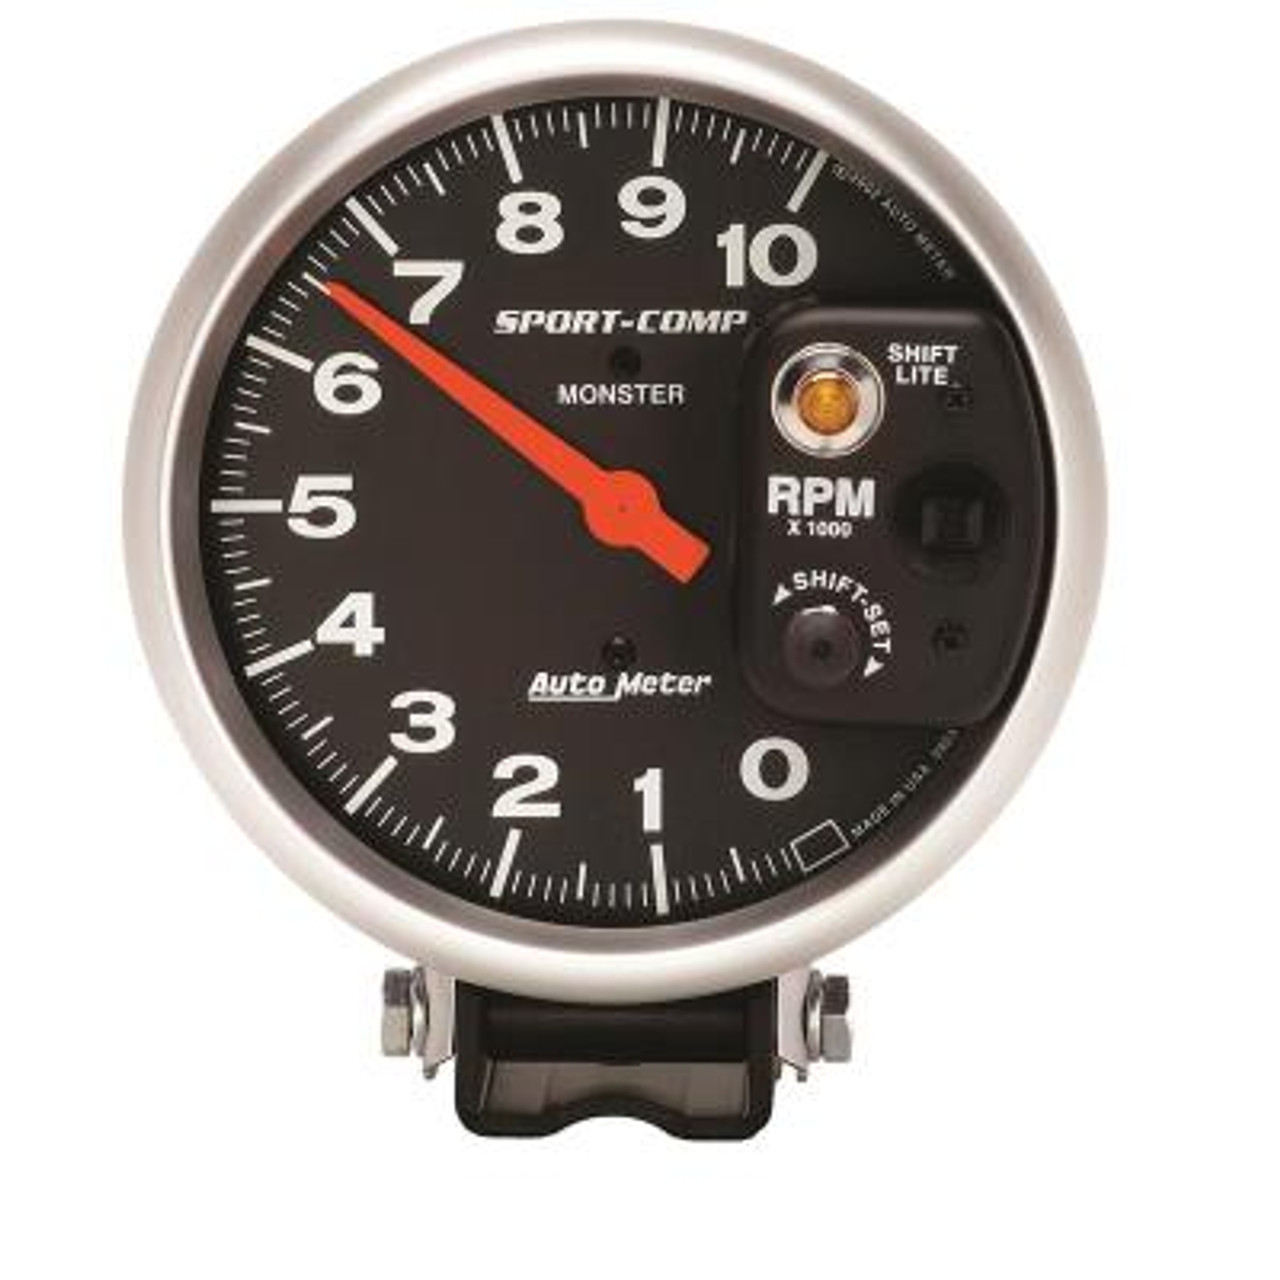 AutoMeter Sport-Comp 3-3/8